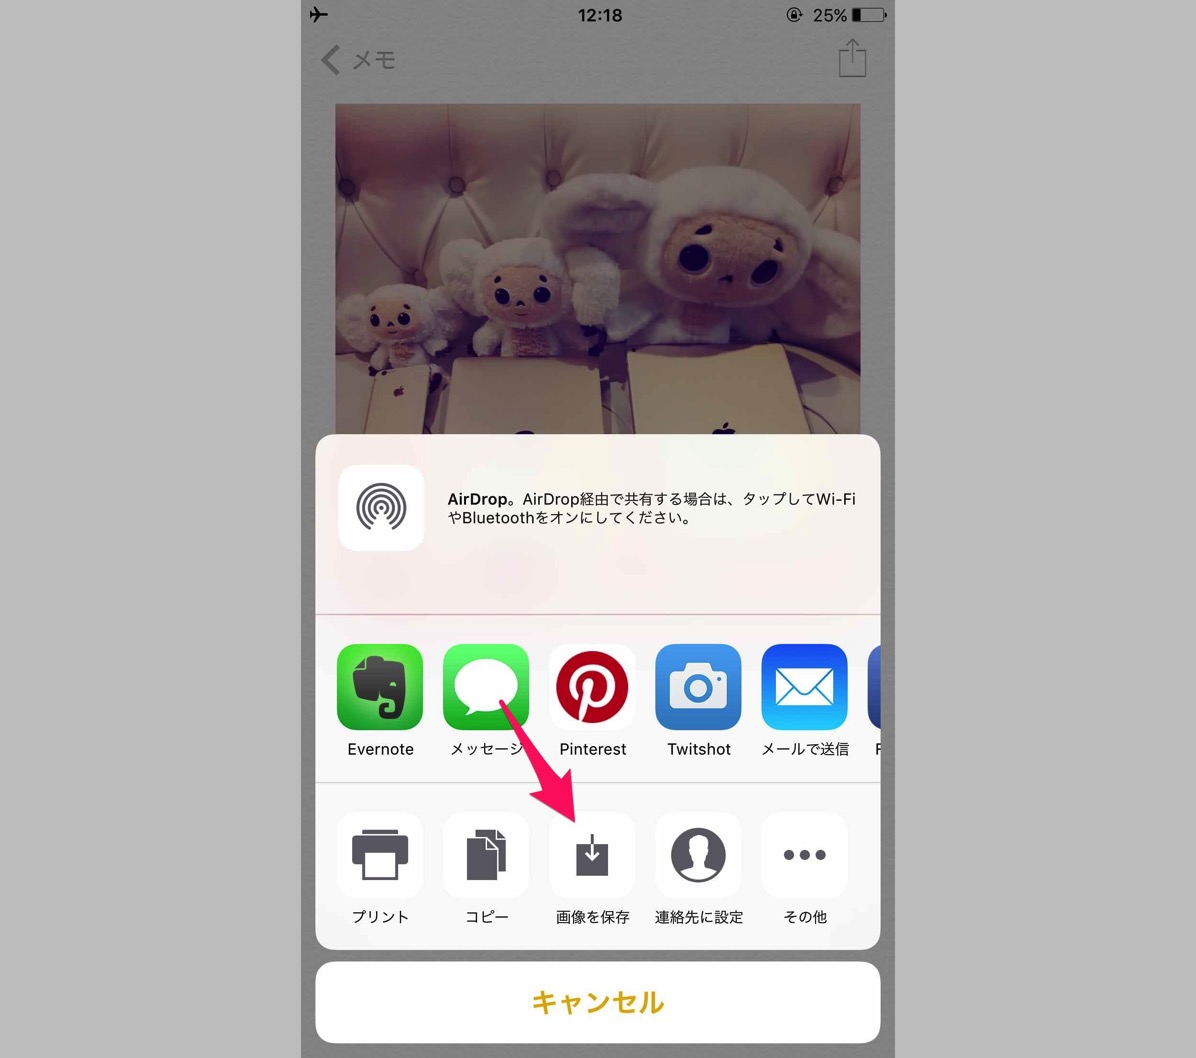 Instagramでアプリを使わずに画像を保存する方法